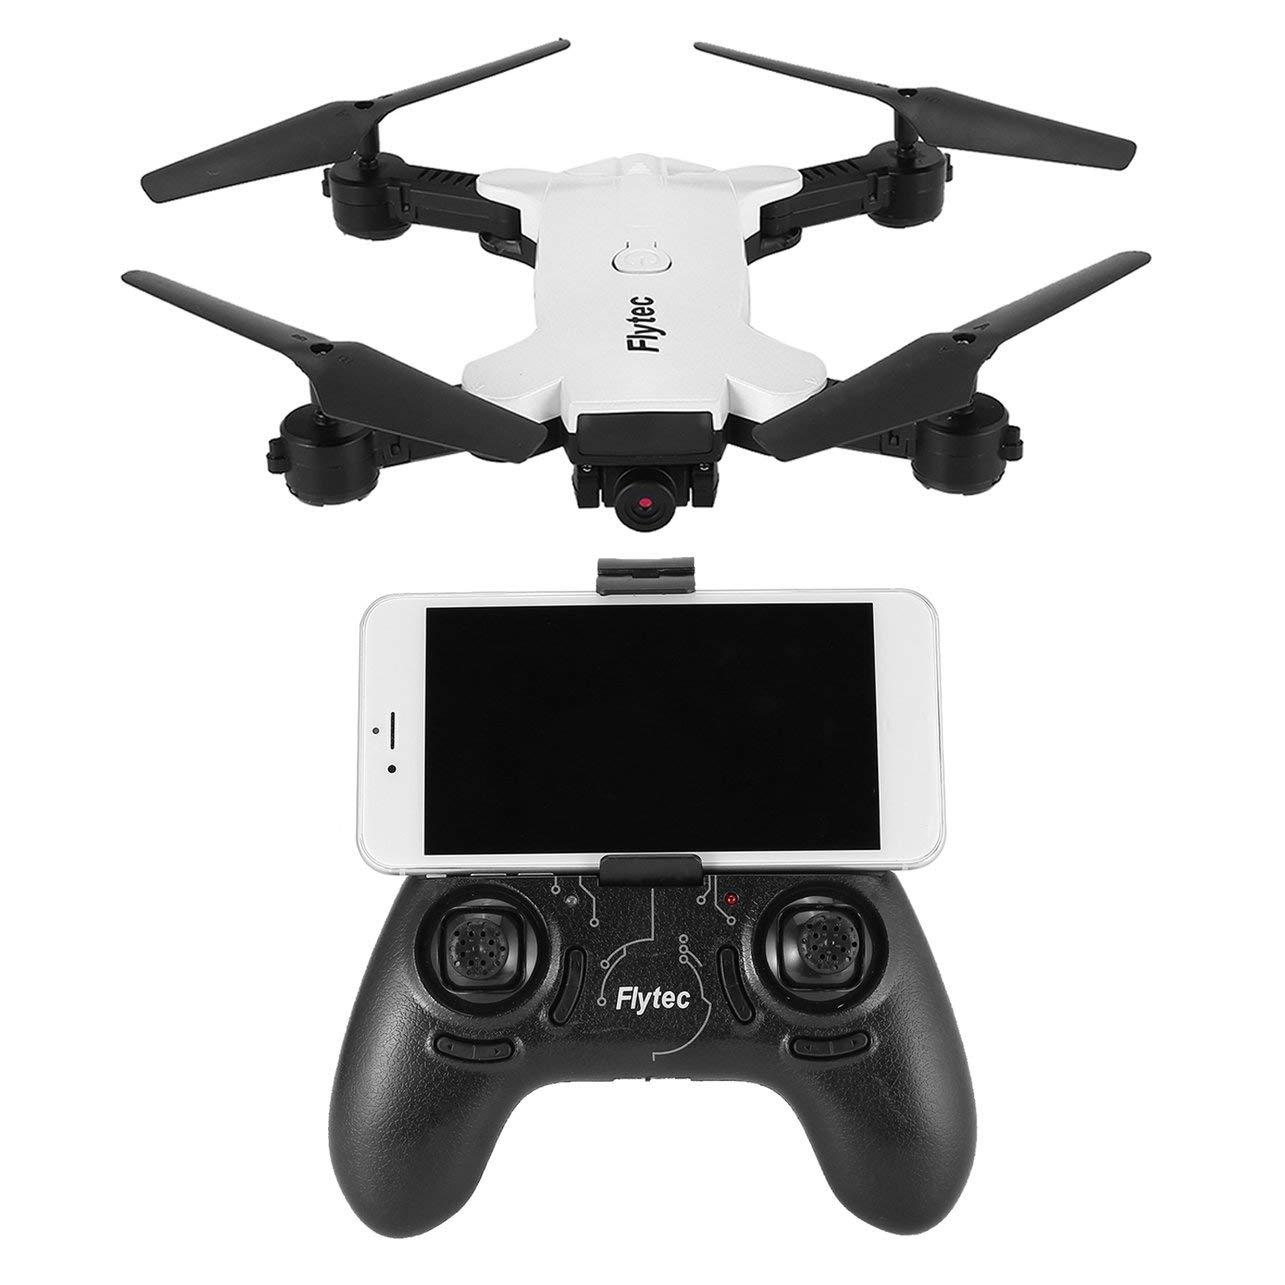 WOSOSYEYO T17 WiFi FPV 720P Kamera Headless-Modus RC Drohne Quadcopter mit Positionierungshöhe Höhe Geste unter Photo3D Flips (Weiß)